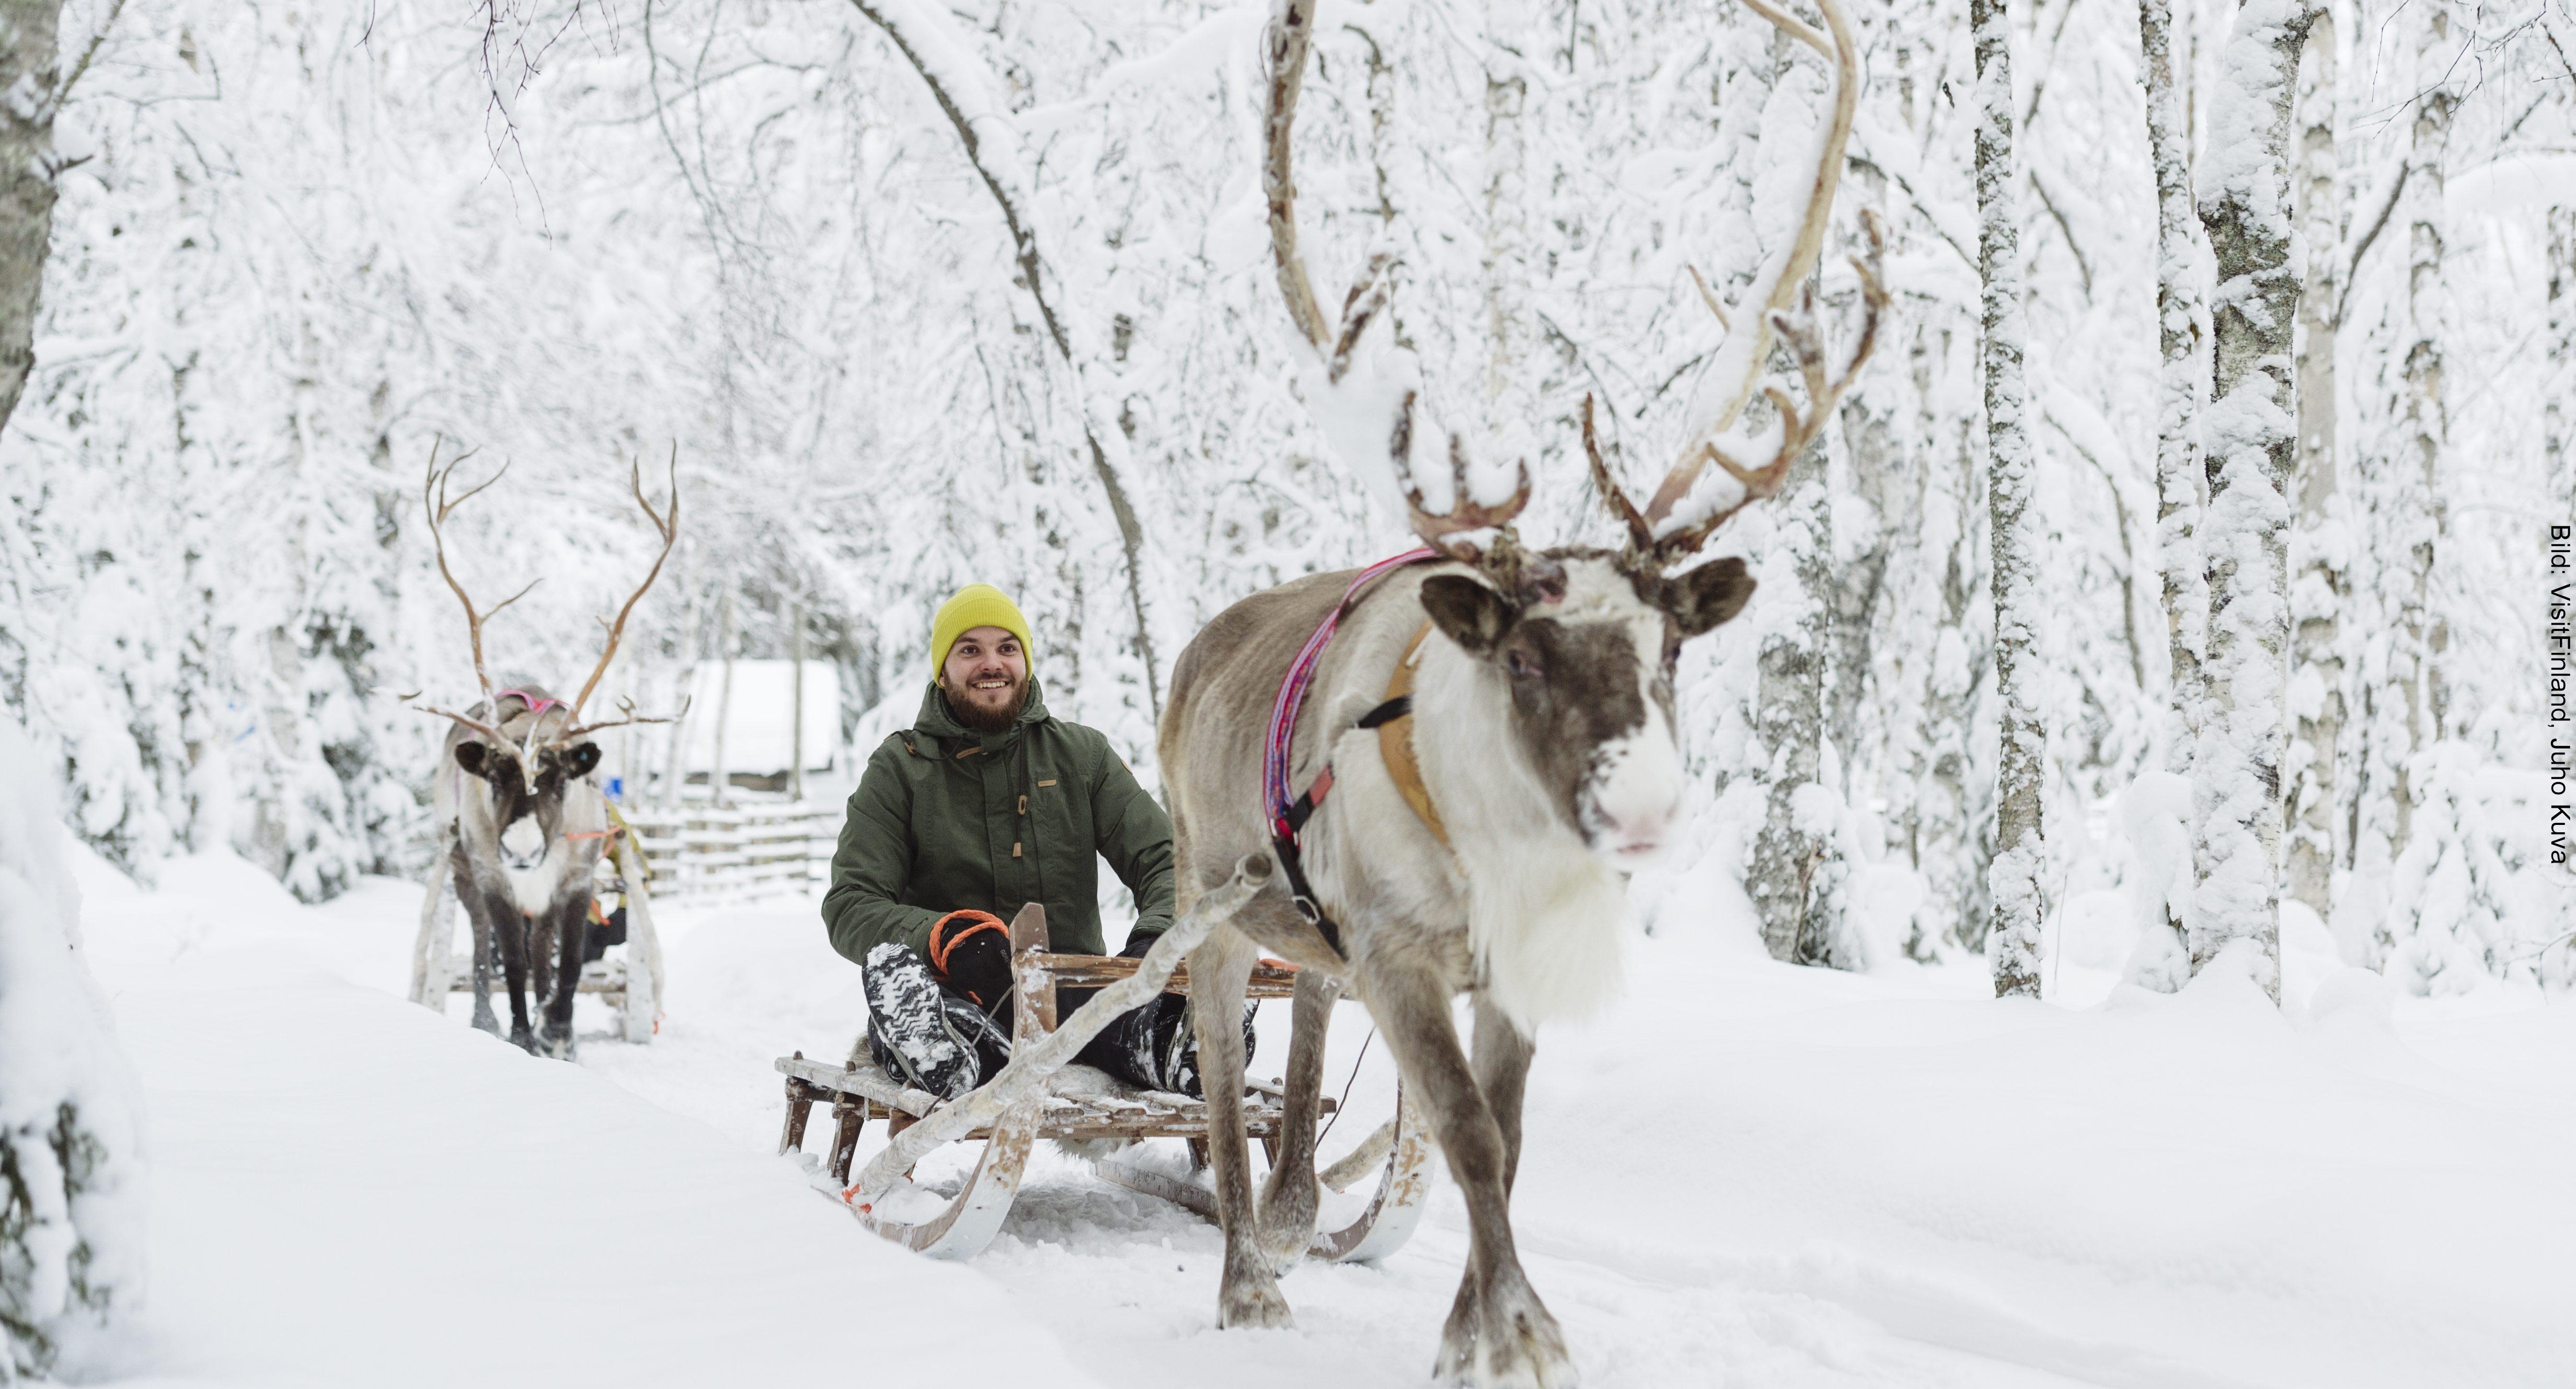 Fähre Finnland Rentierschlitten